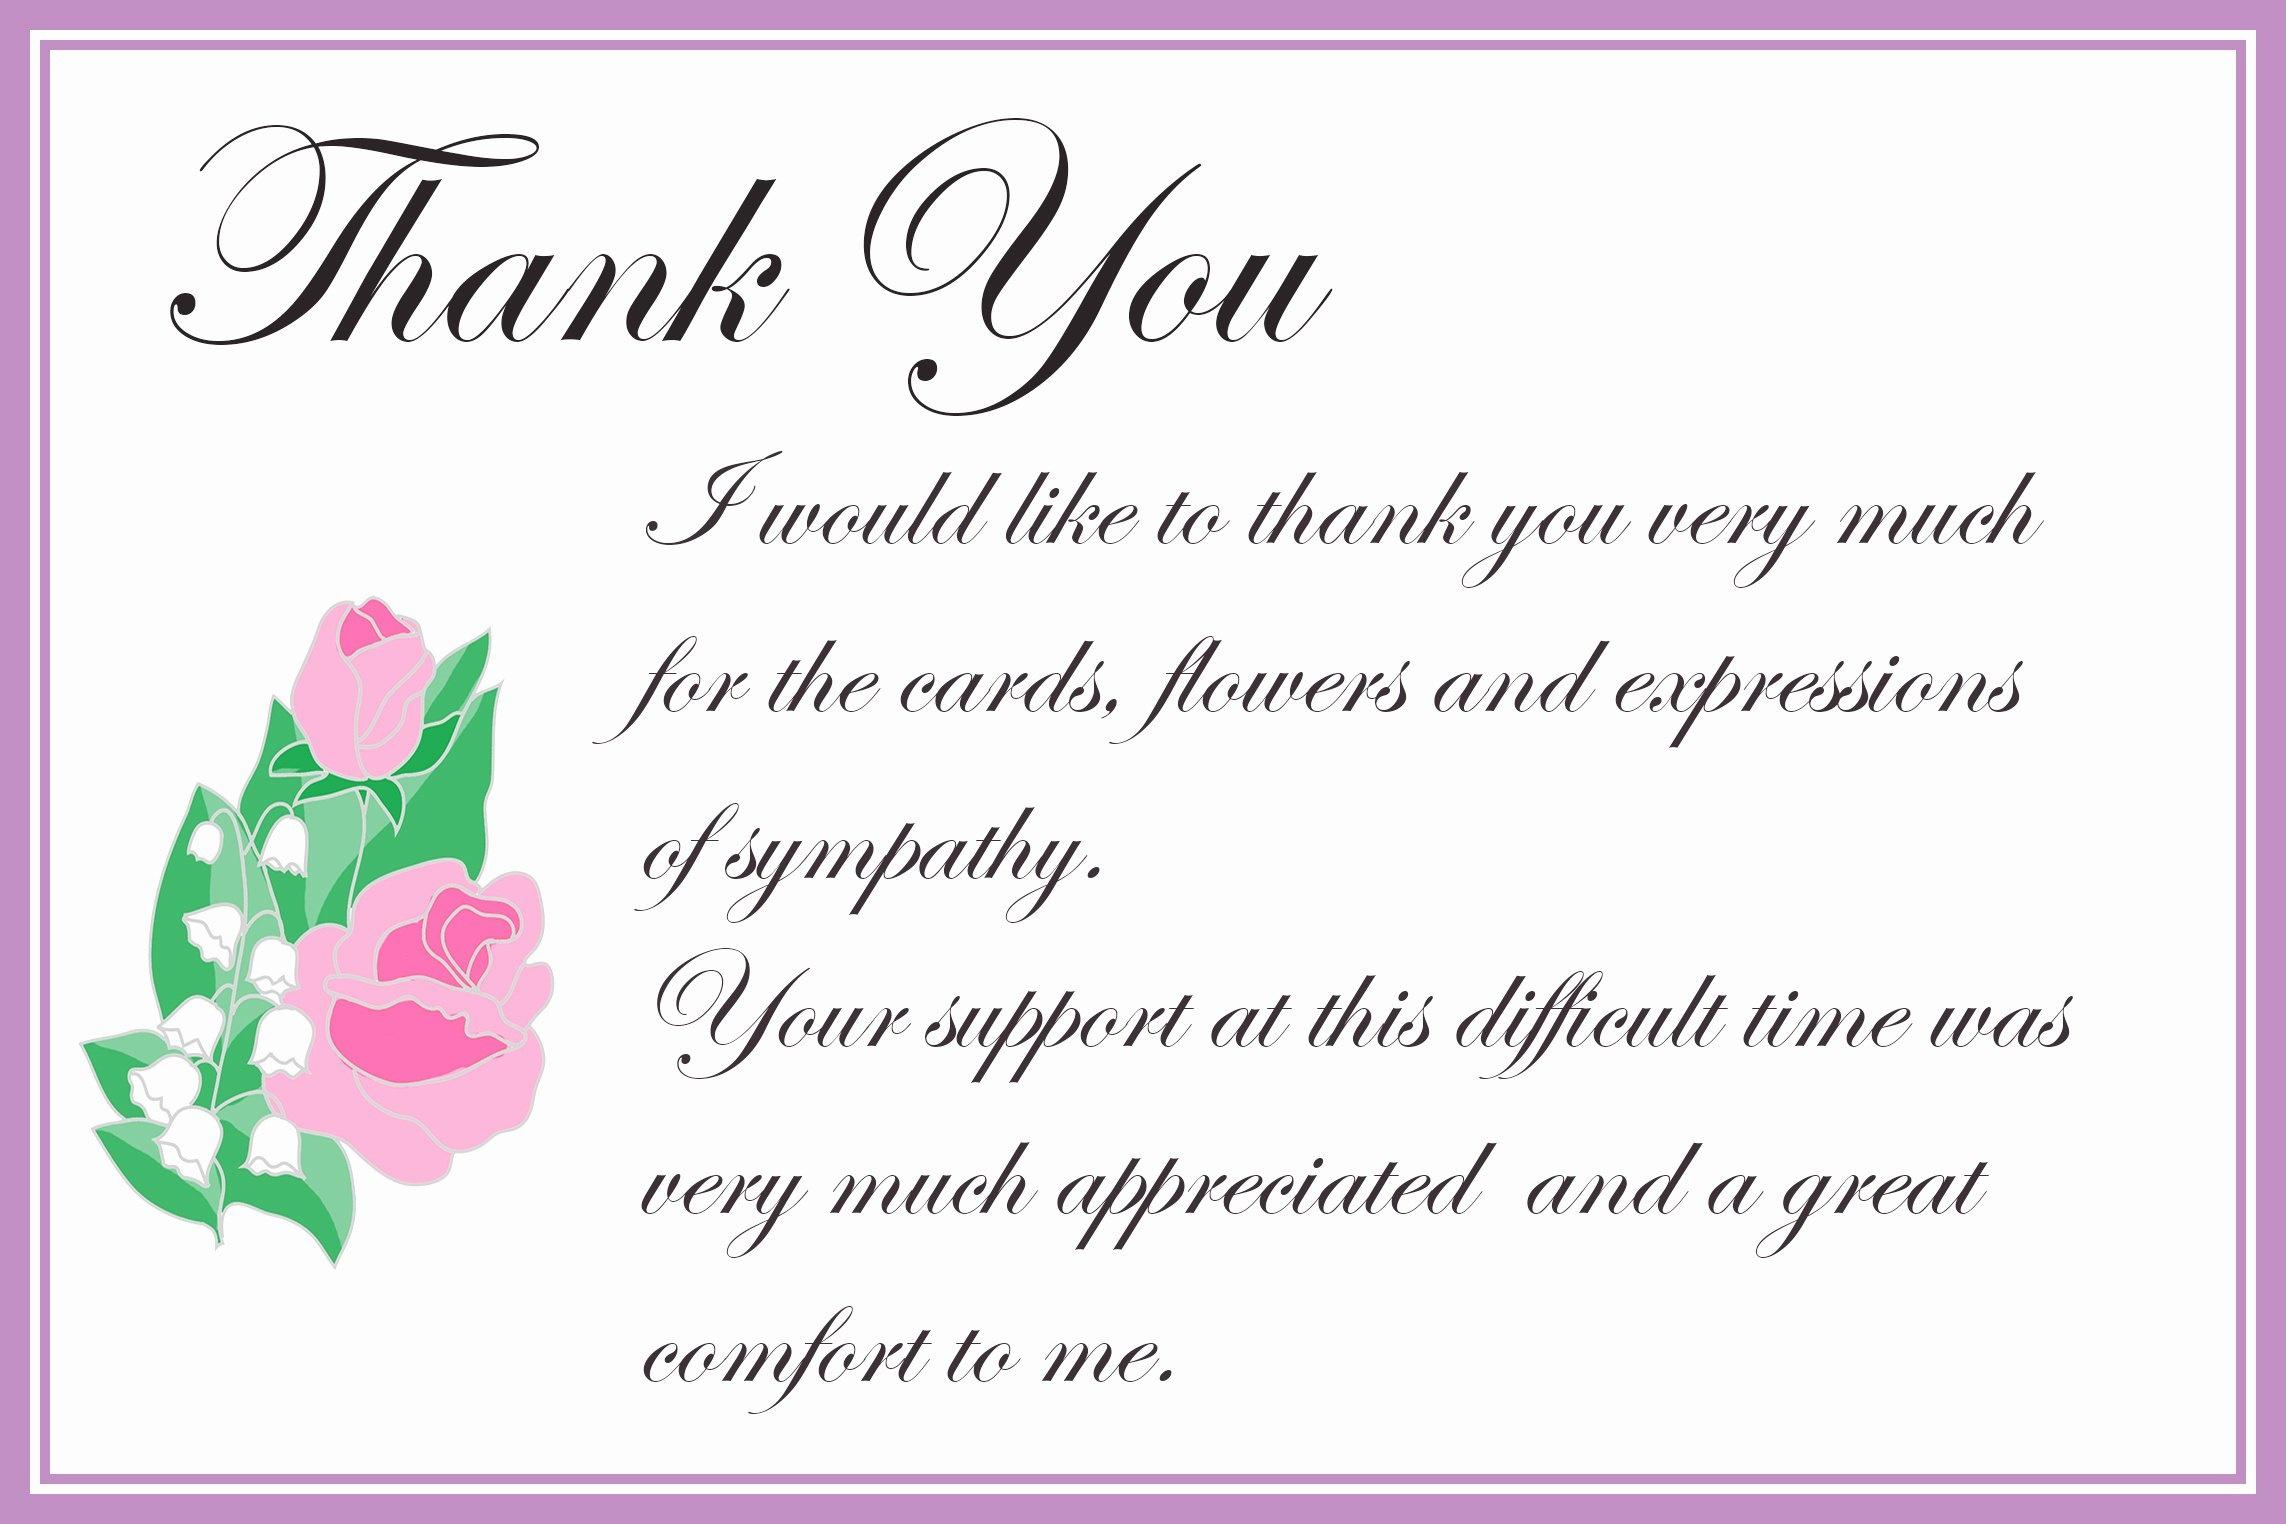 Thank You Quotes For Condolences | Collegiosanlorenzo - Thank You Sympathy Cards Free Printable